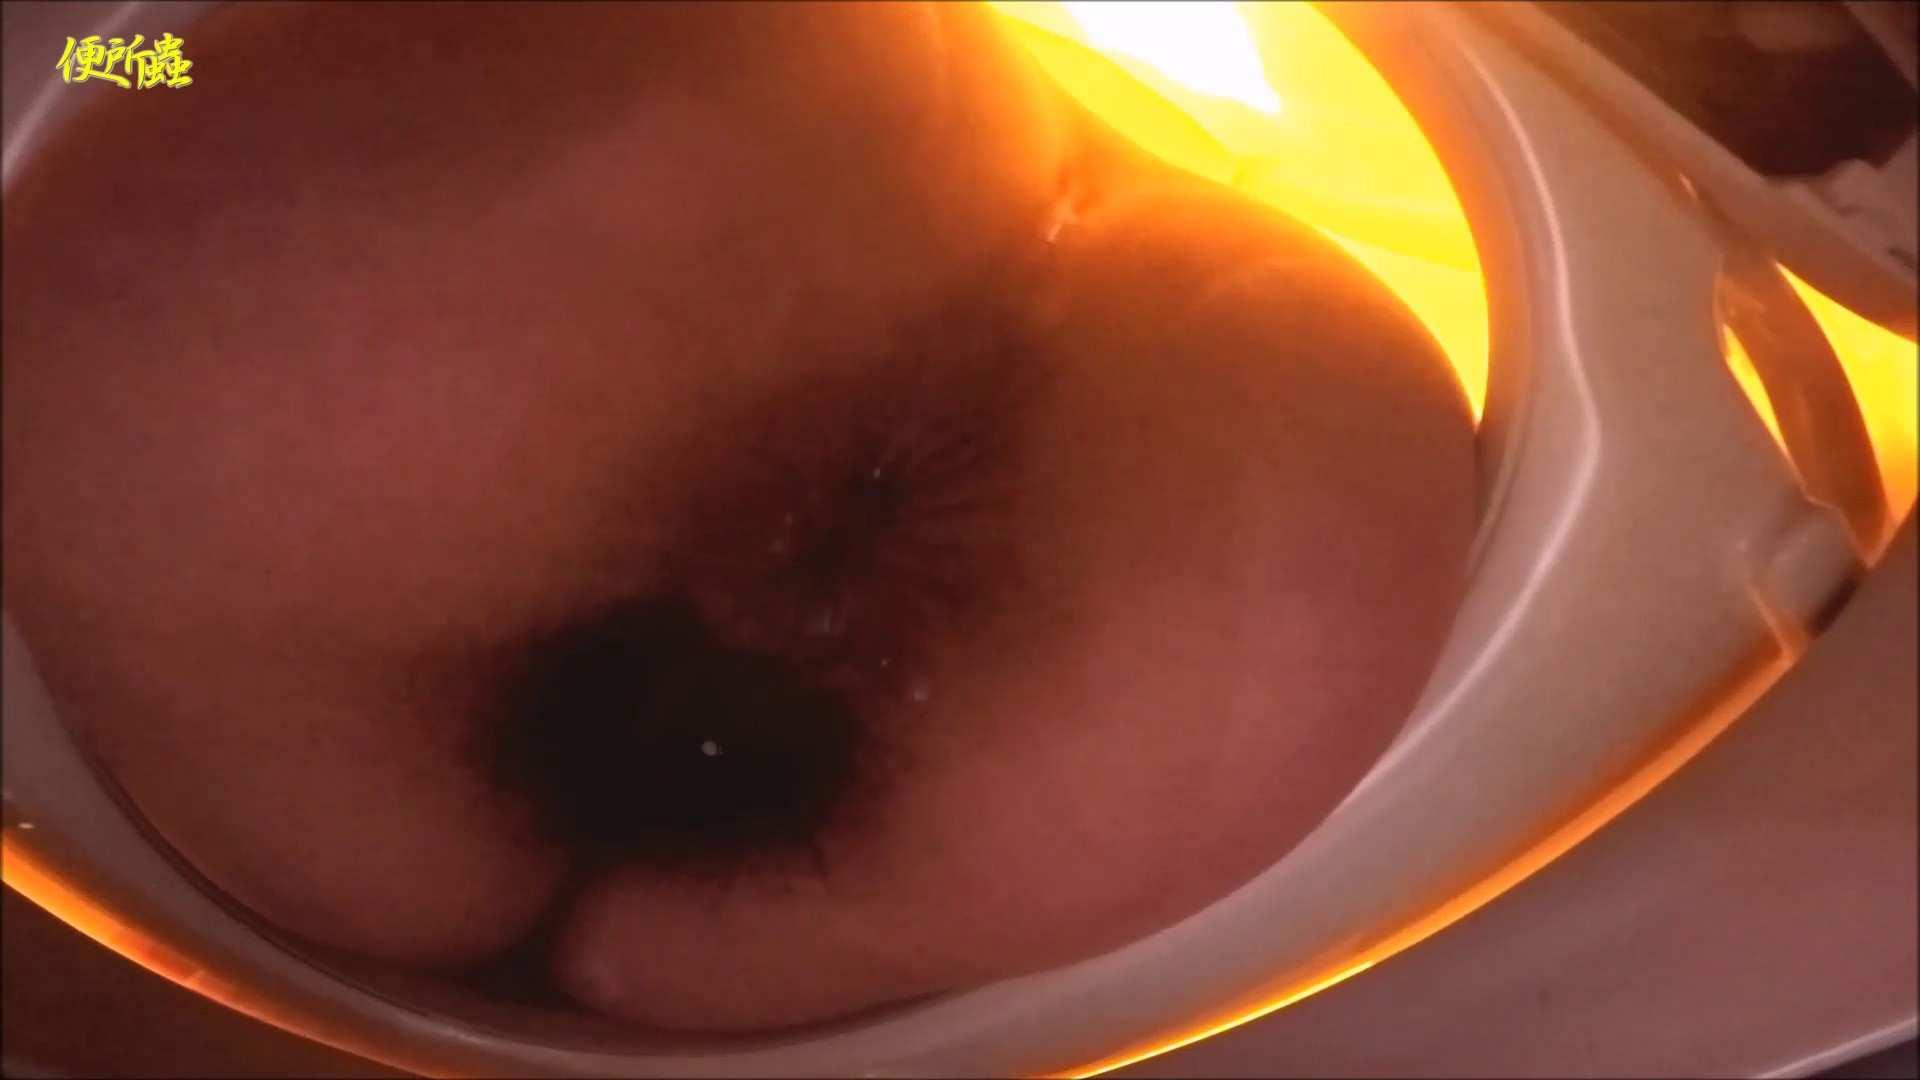 vol.08 便所蟲さんのリターン~寺子屋洗面所盗撮~ 盛合せ ヌード画像 94画像 19